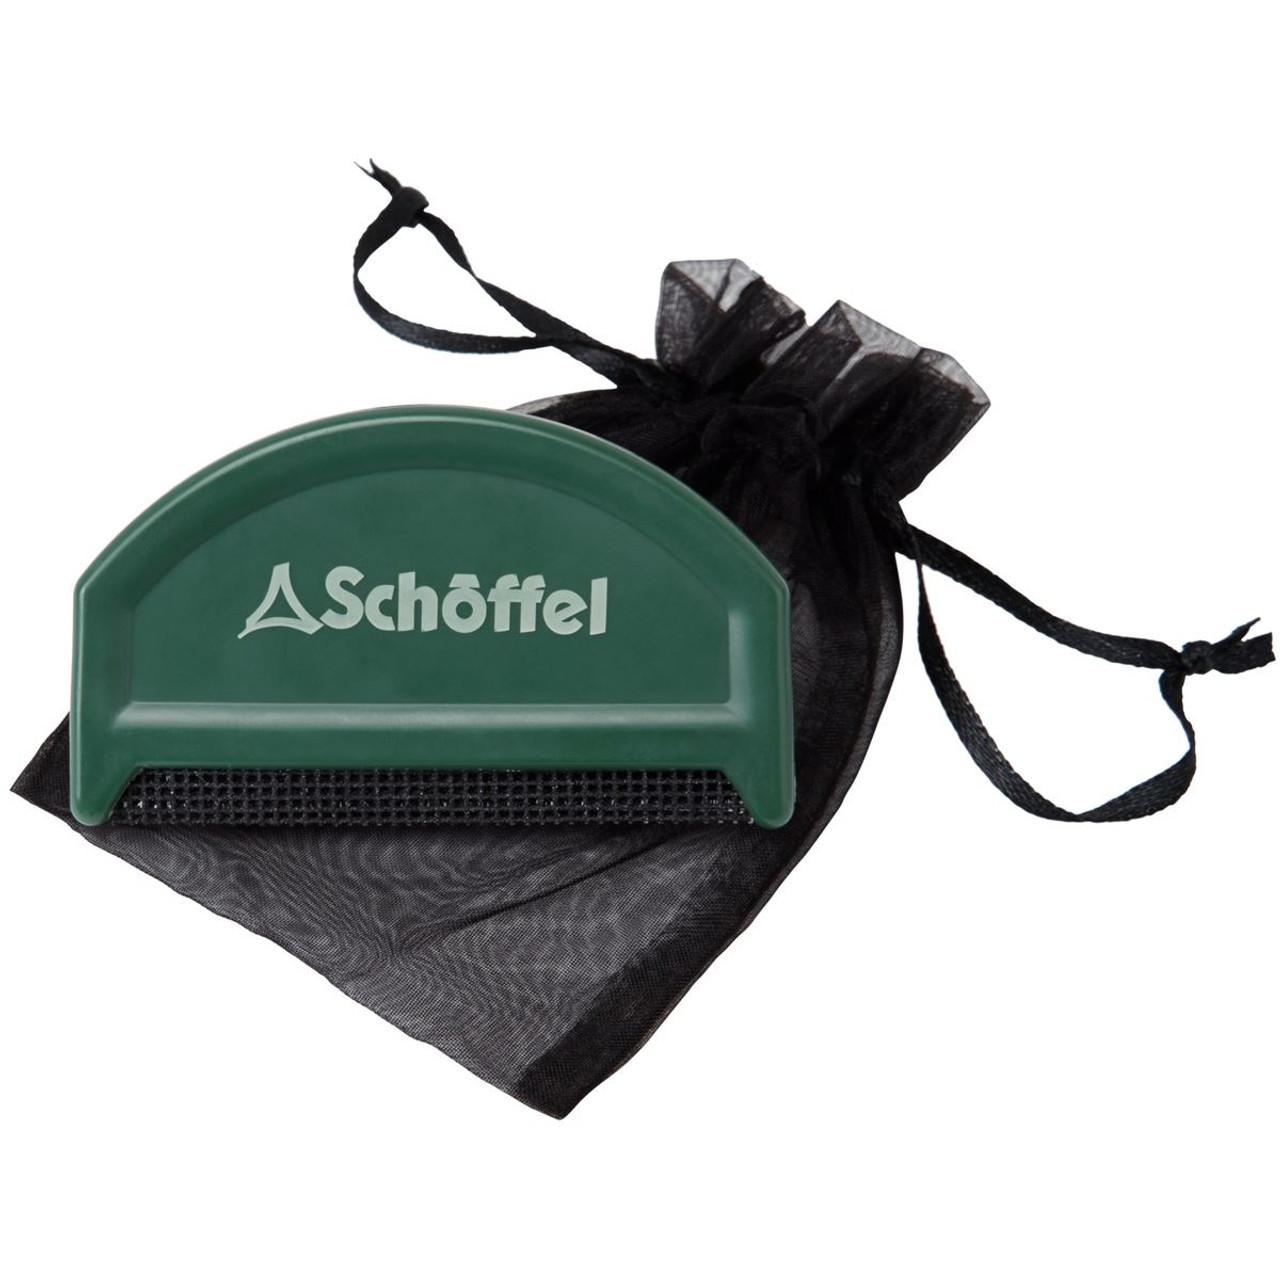 Schoffel Cashmere Comb